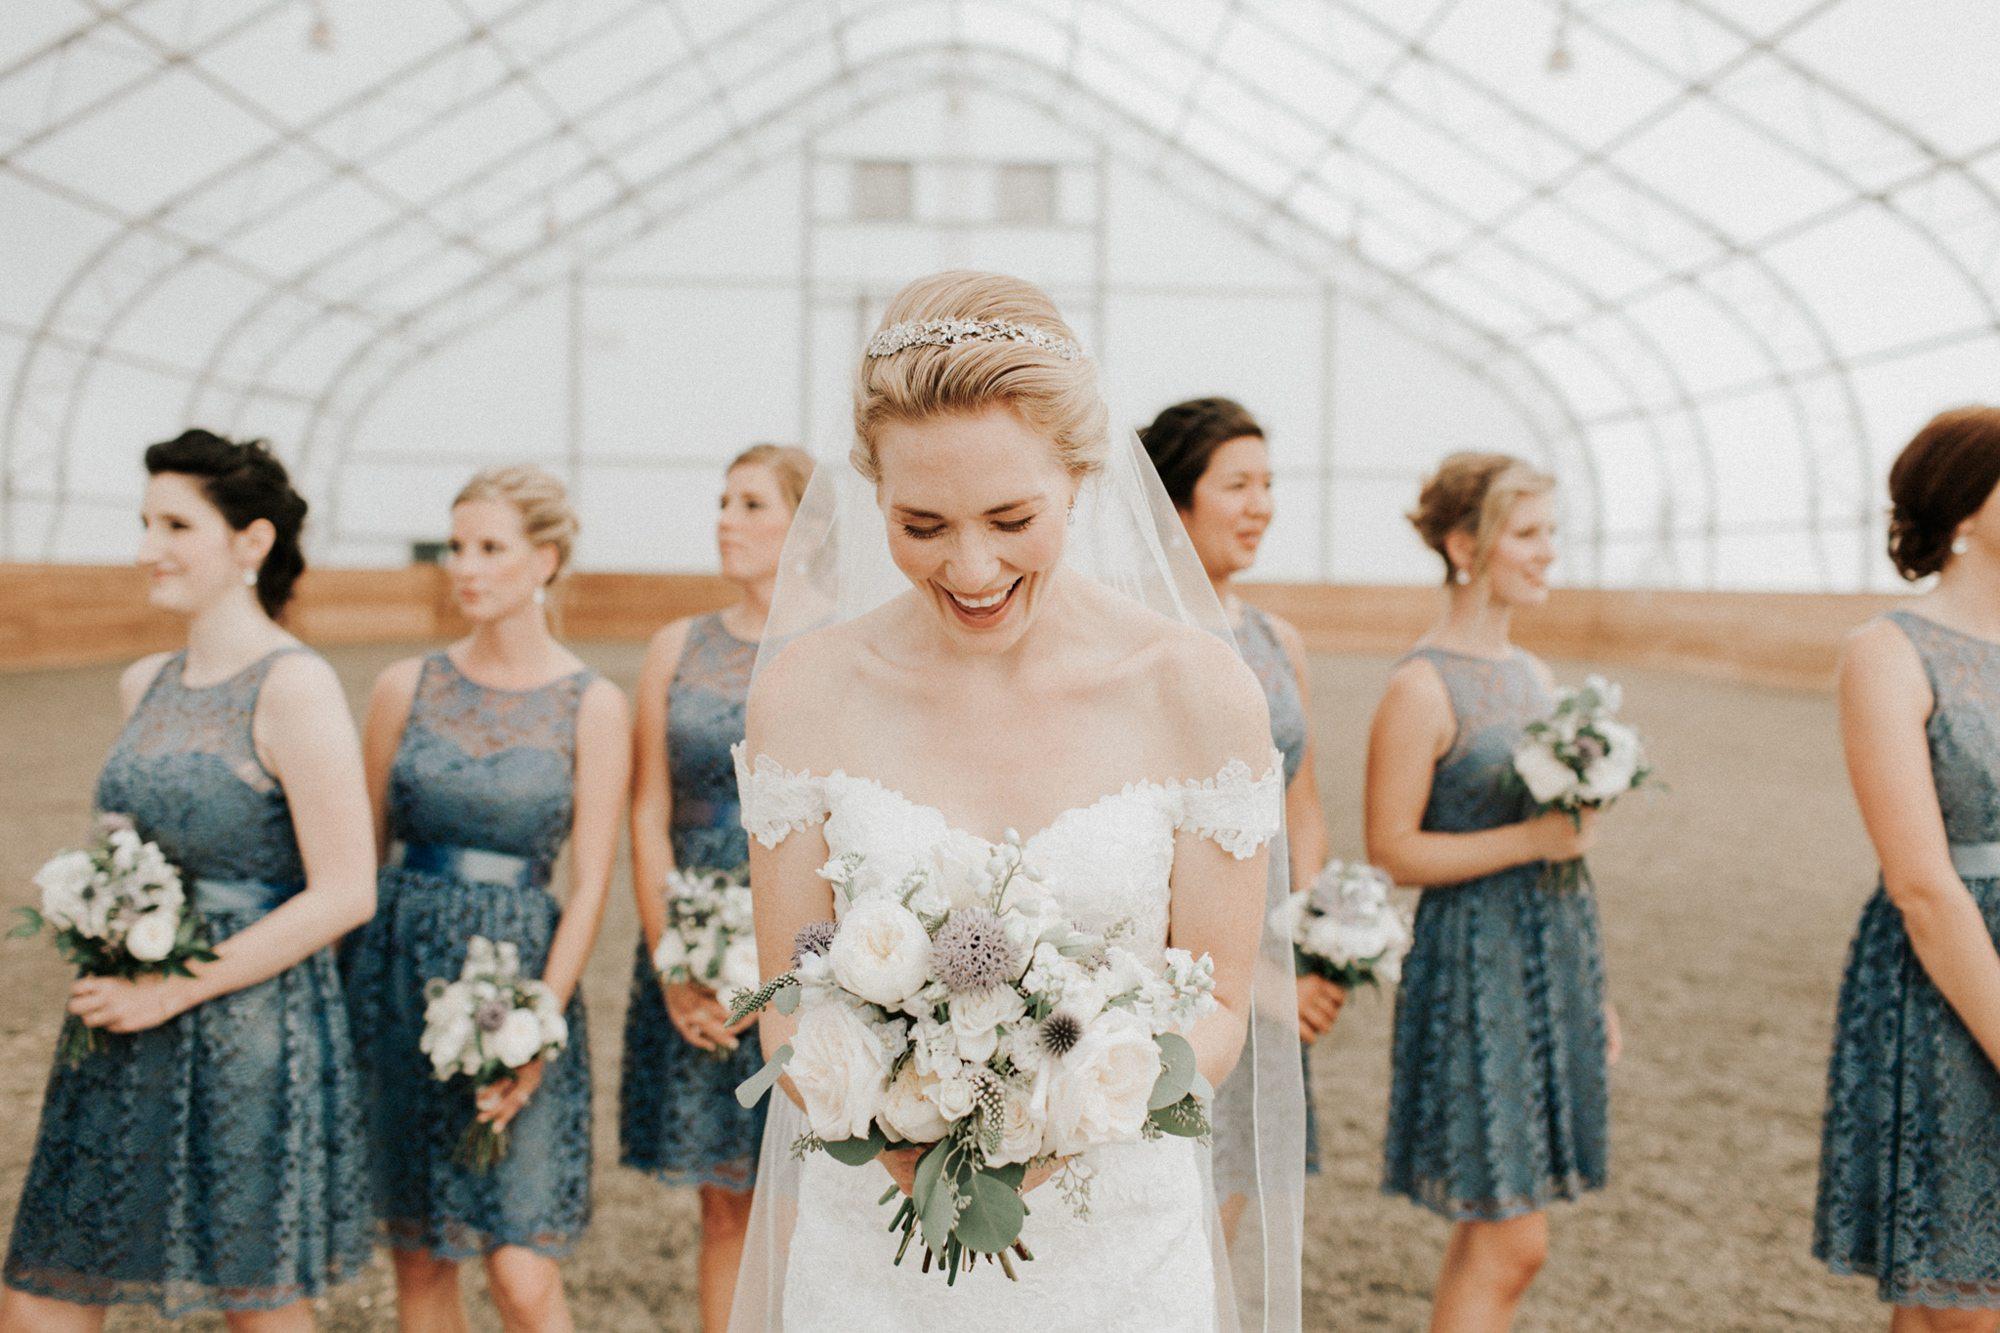 265-kelowna-wedding-photographer